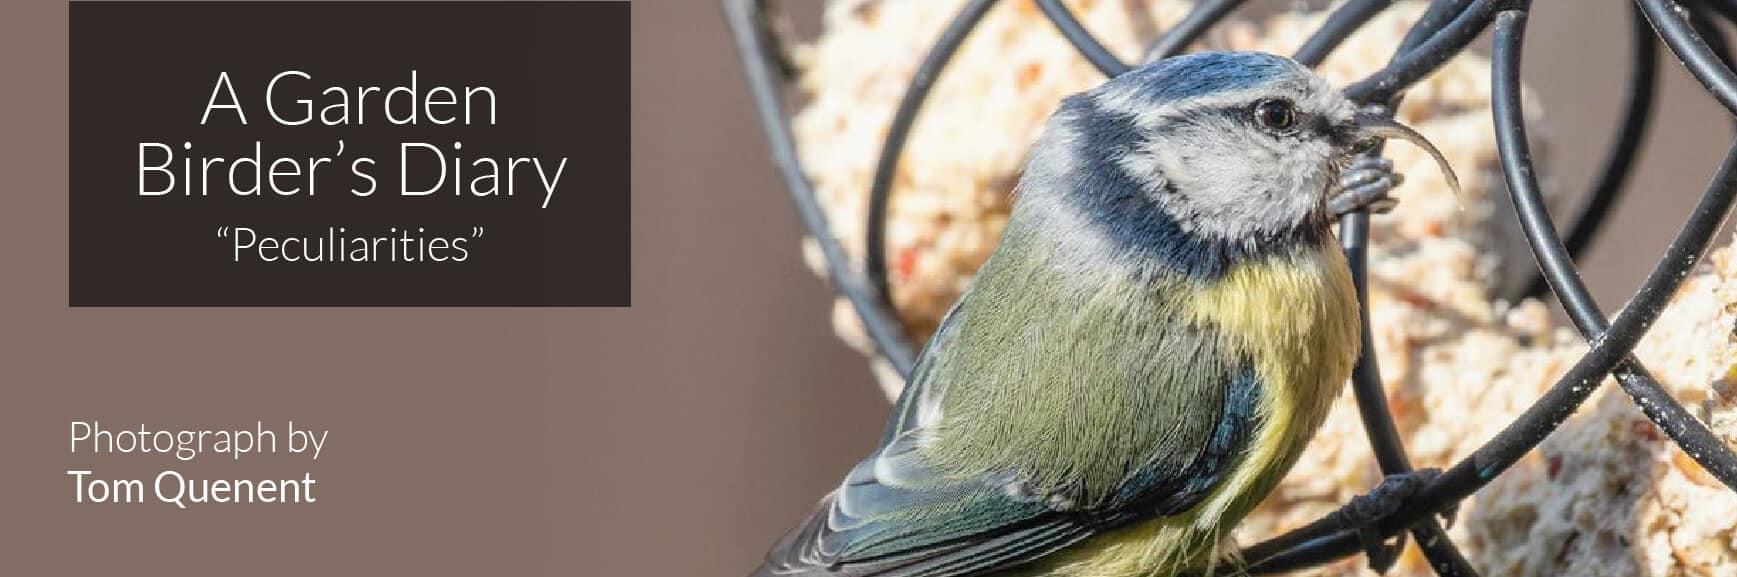 A Garden Birder's Diary – Peculiarities